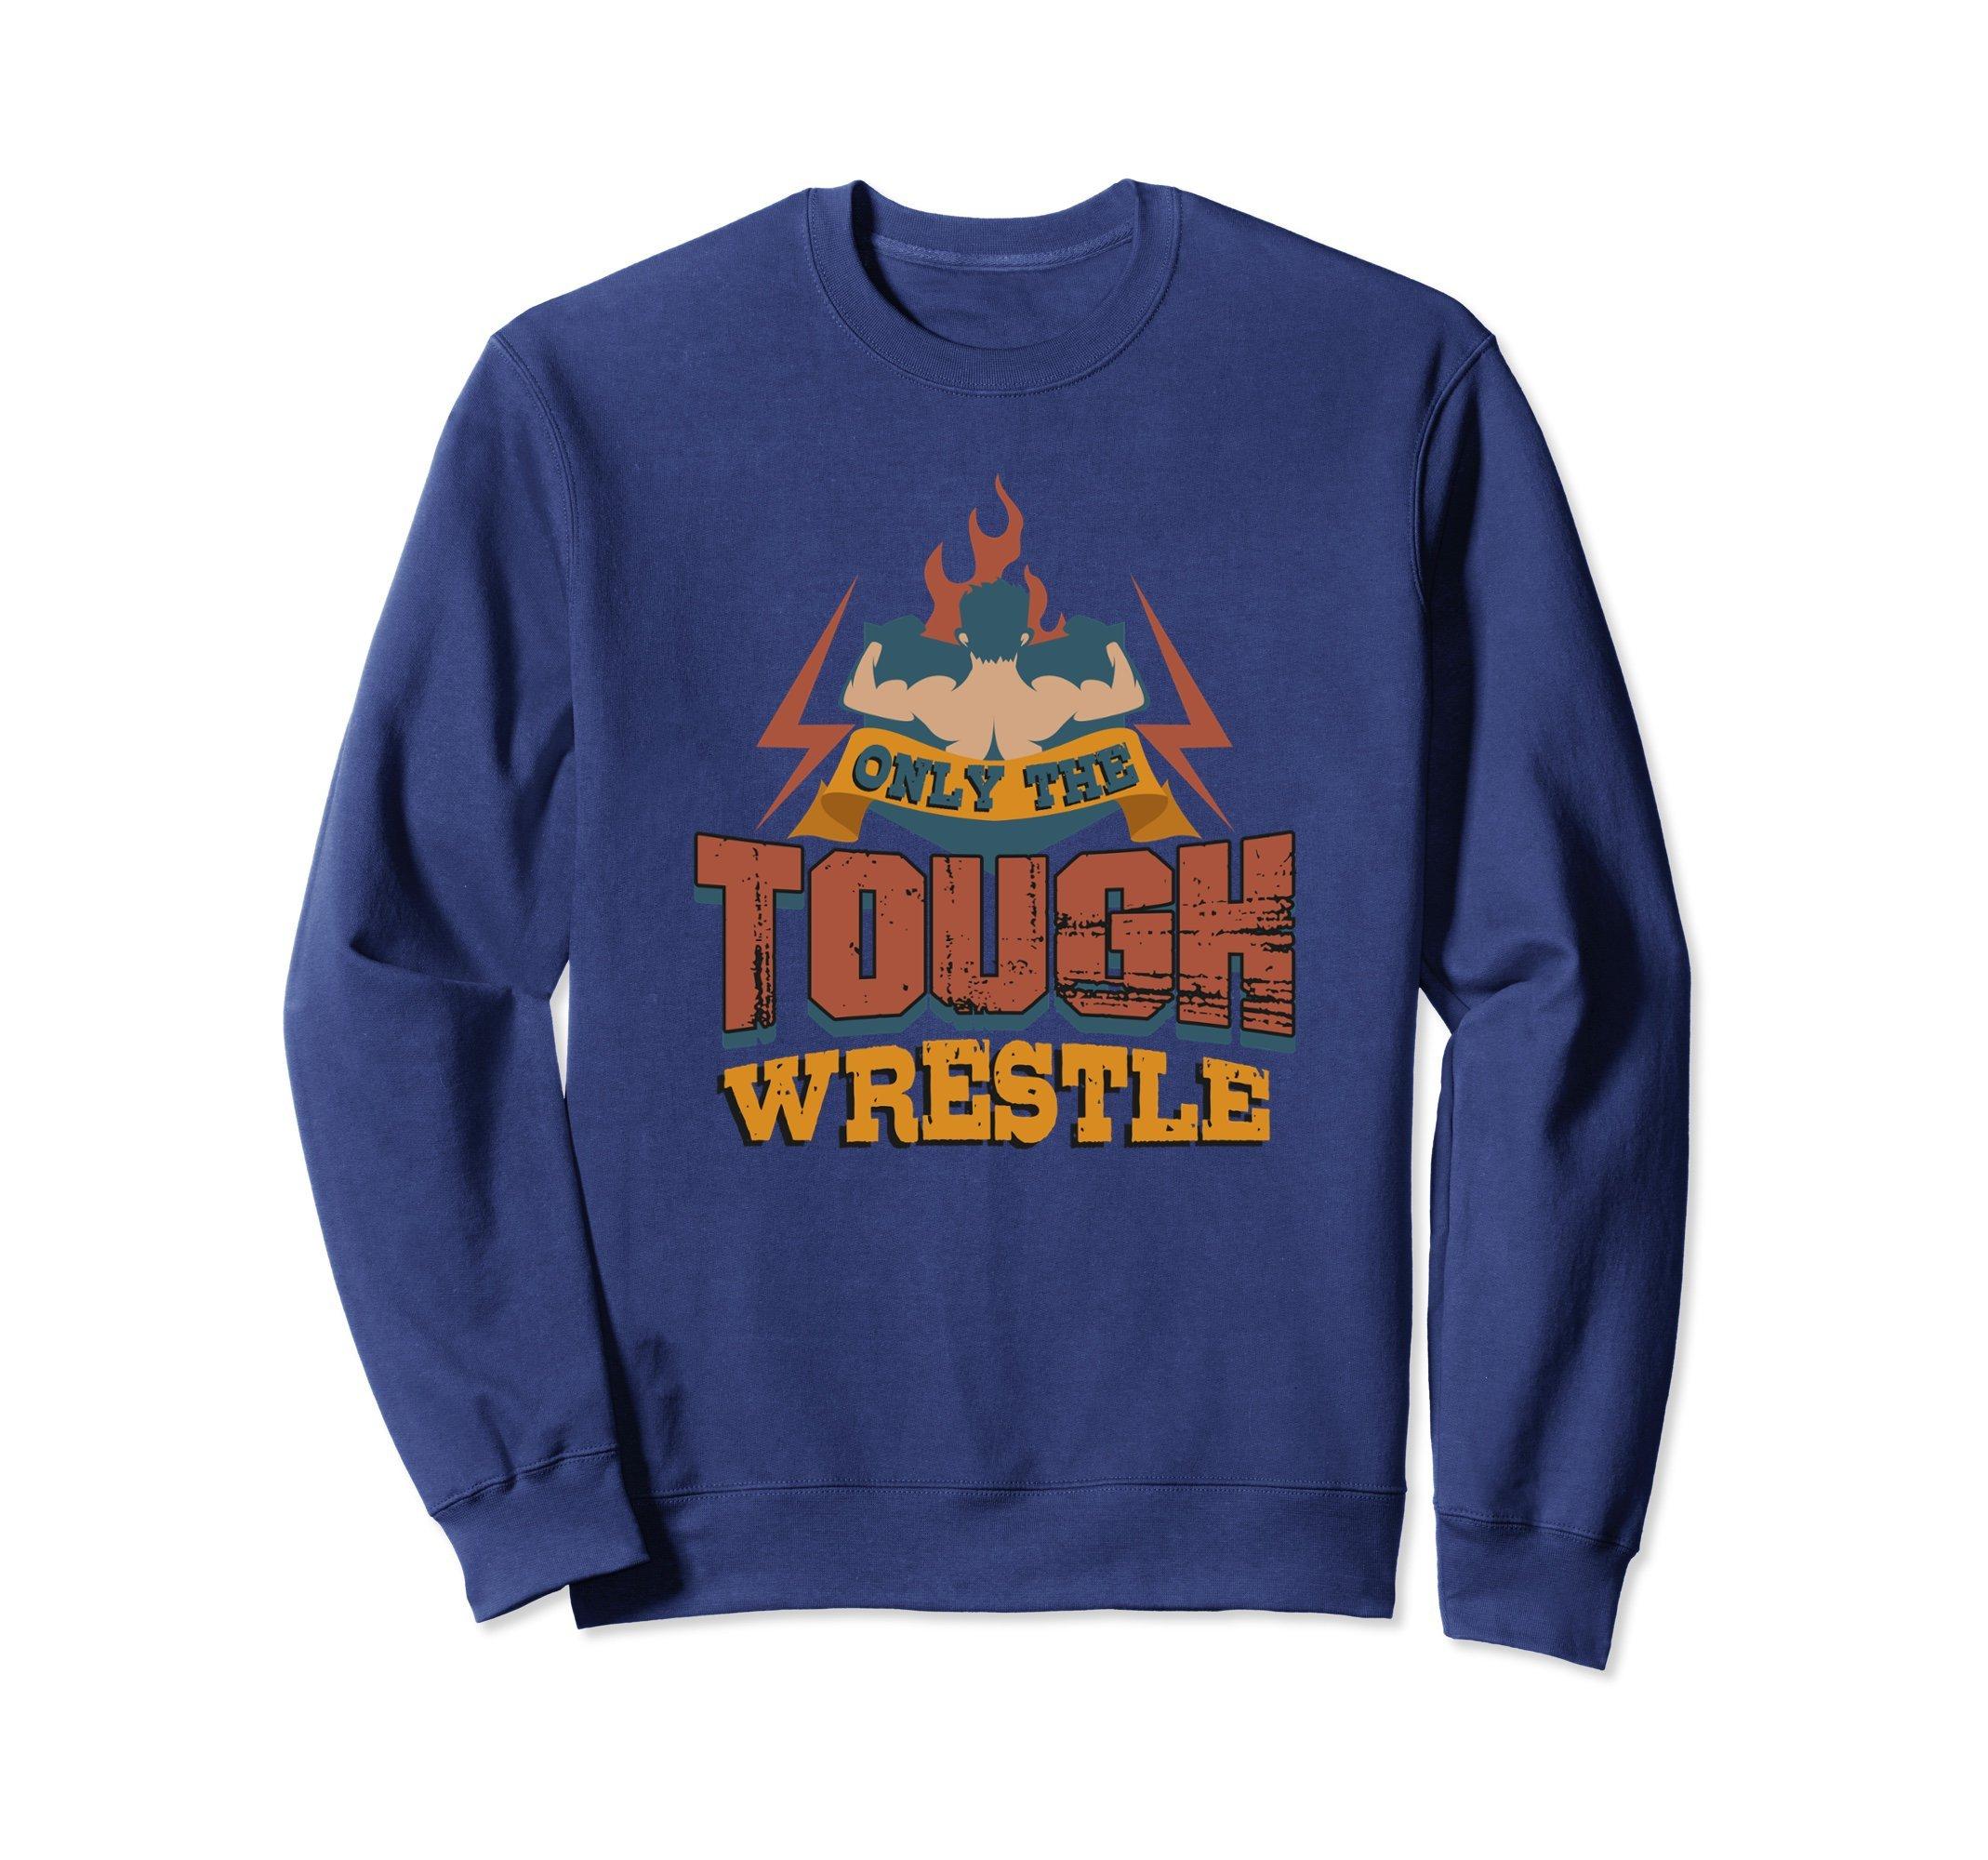 Unisex Only The Tough Wrestle Motivational Wrestling Sweatshirt XL: Navy